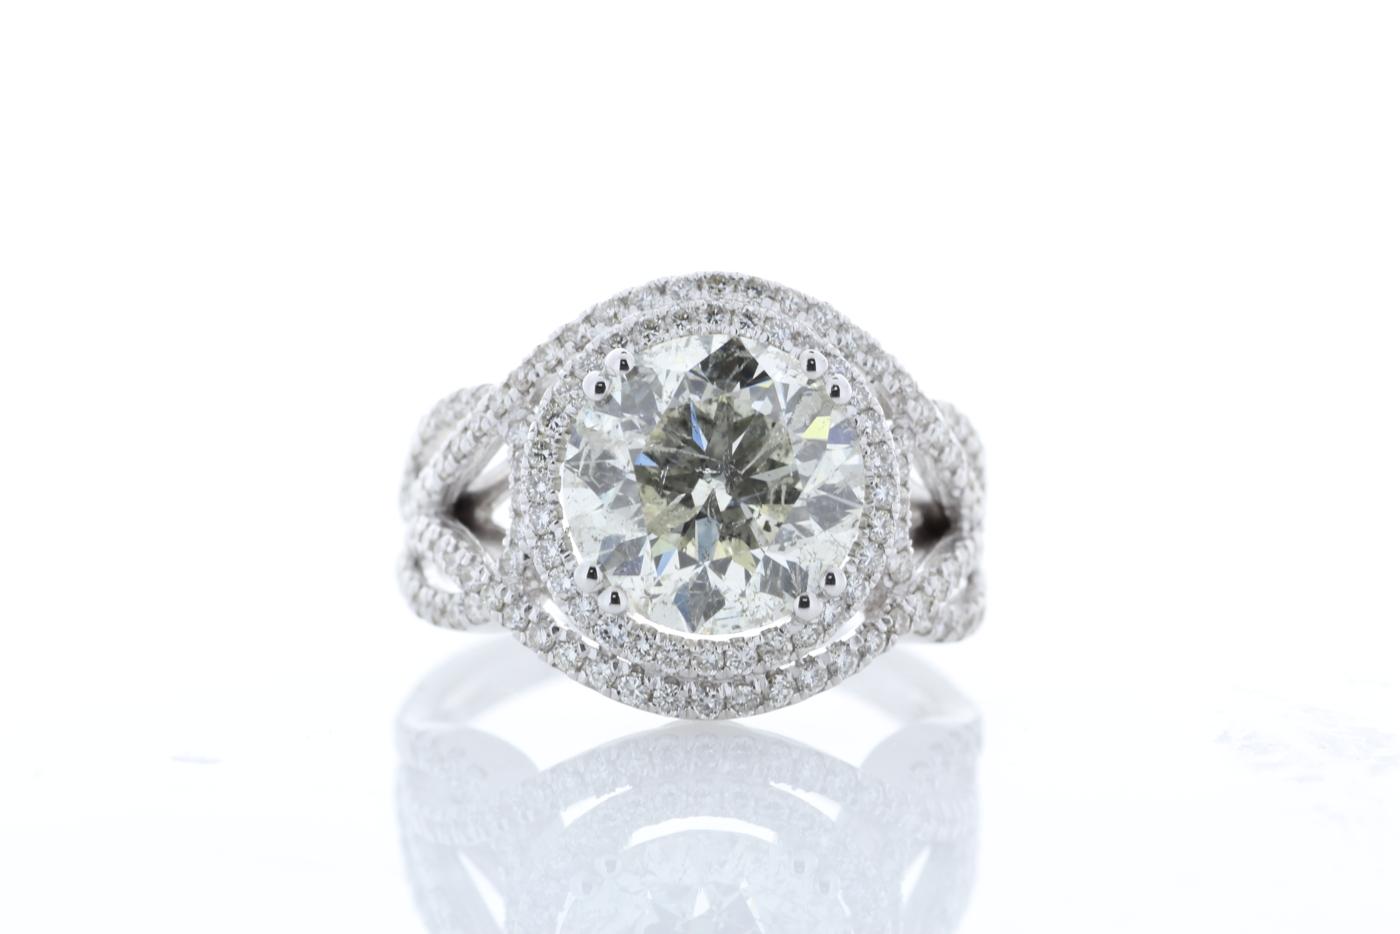 18k White Gold Single Stone With Halo Setting Ring 5.17 - Image 2 of 5